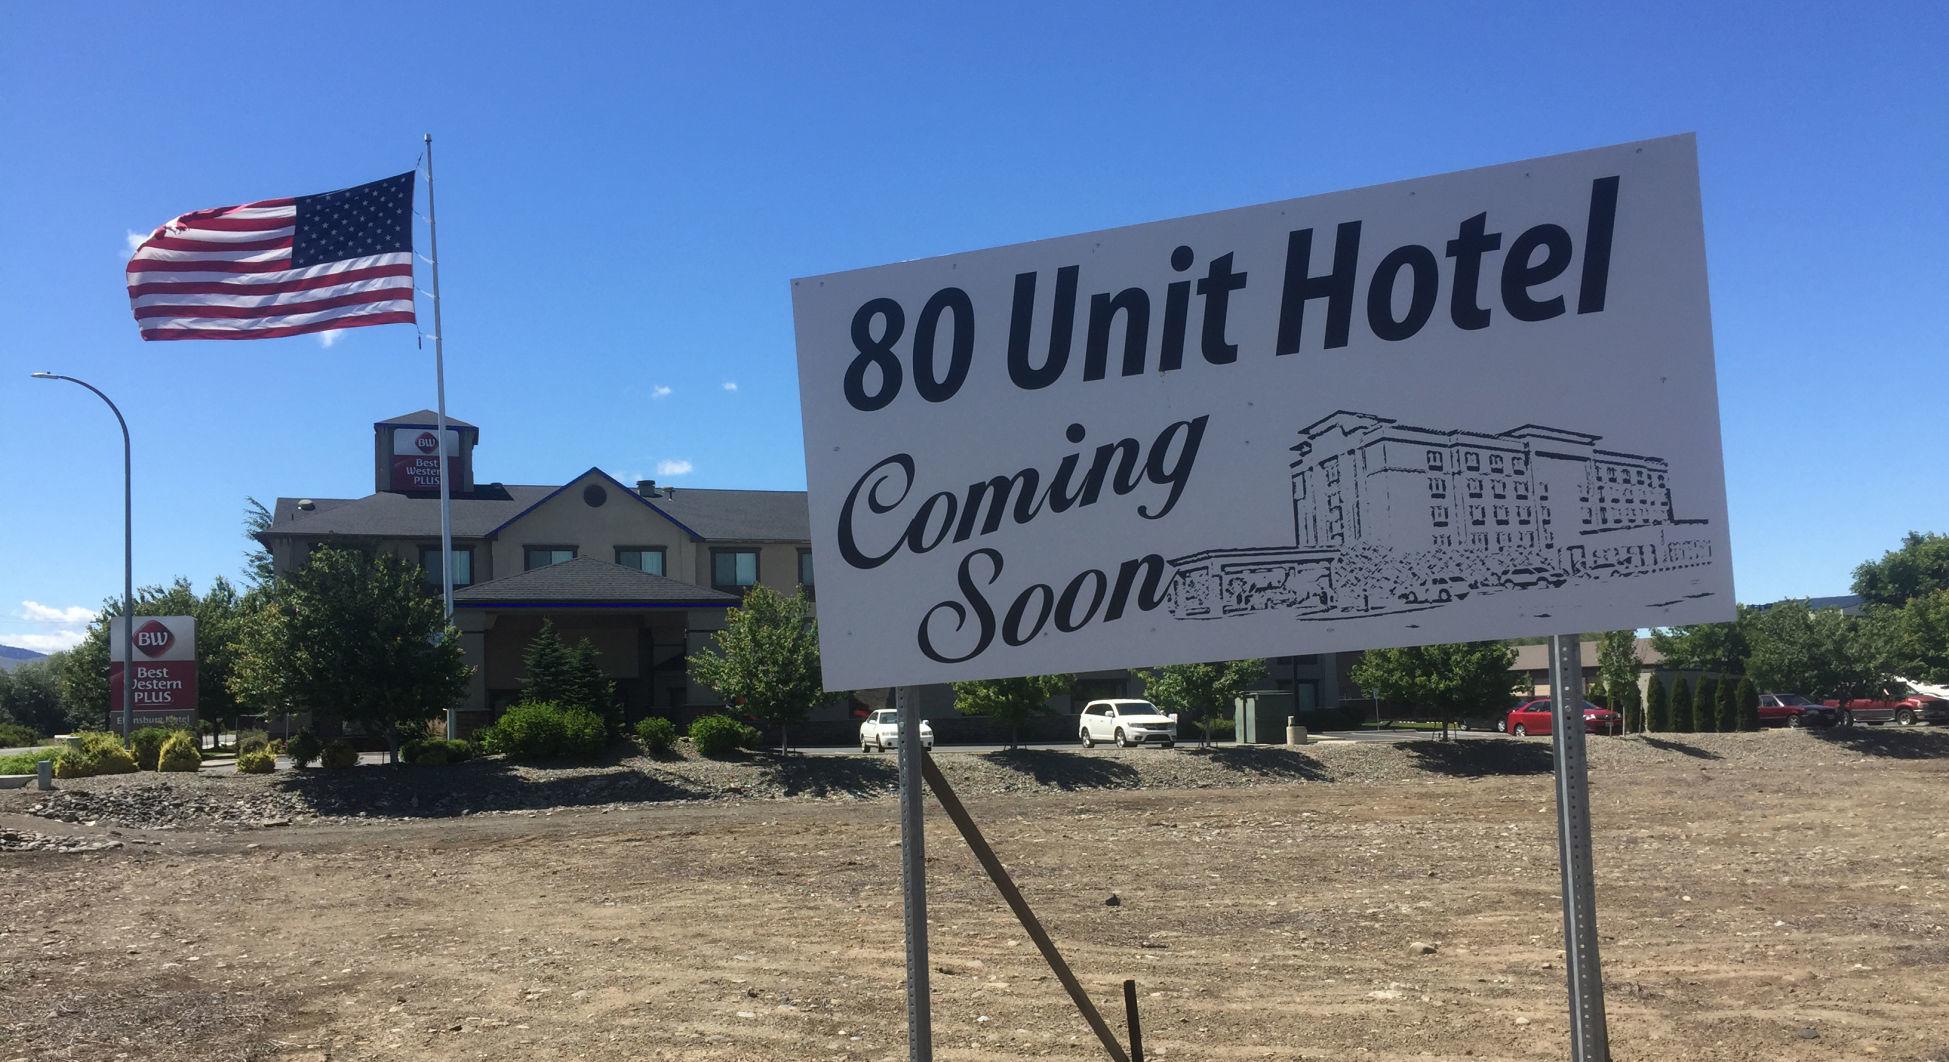 80-unit hotel & Under construction: Ellensburg a hub of construction activity | News ...